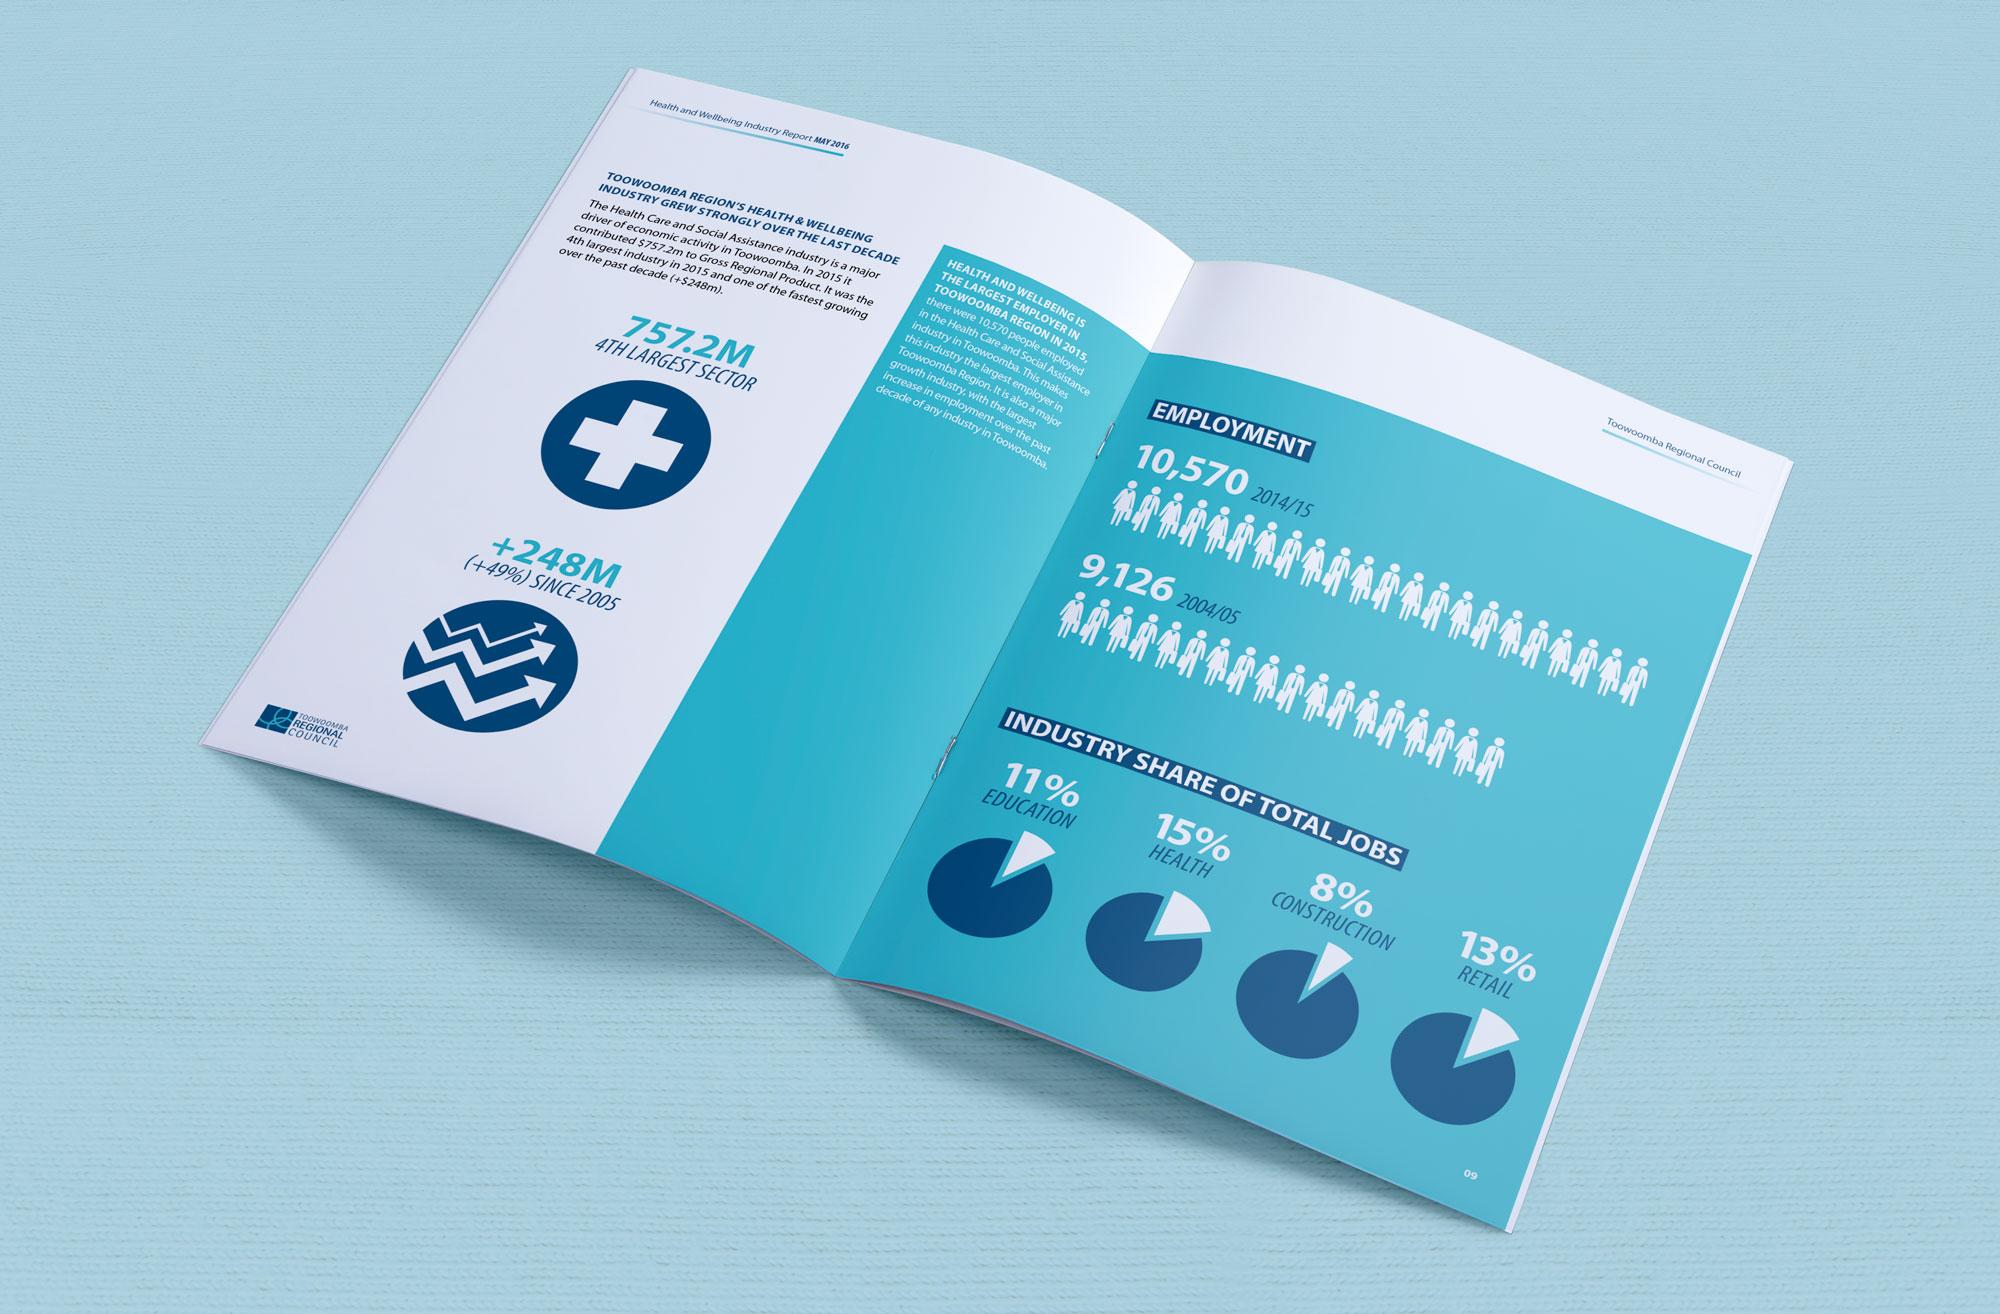 Info graphic report design by whitedutch.com.au